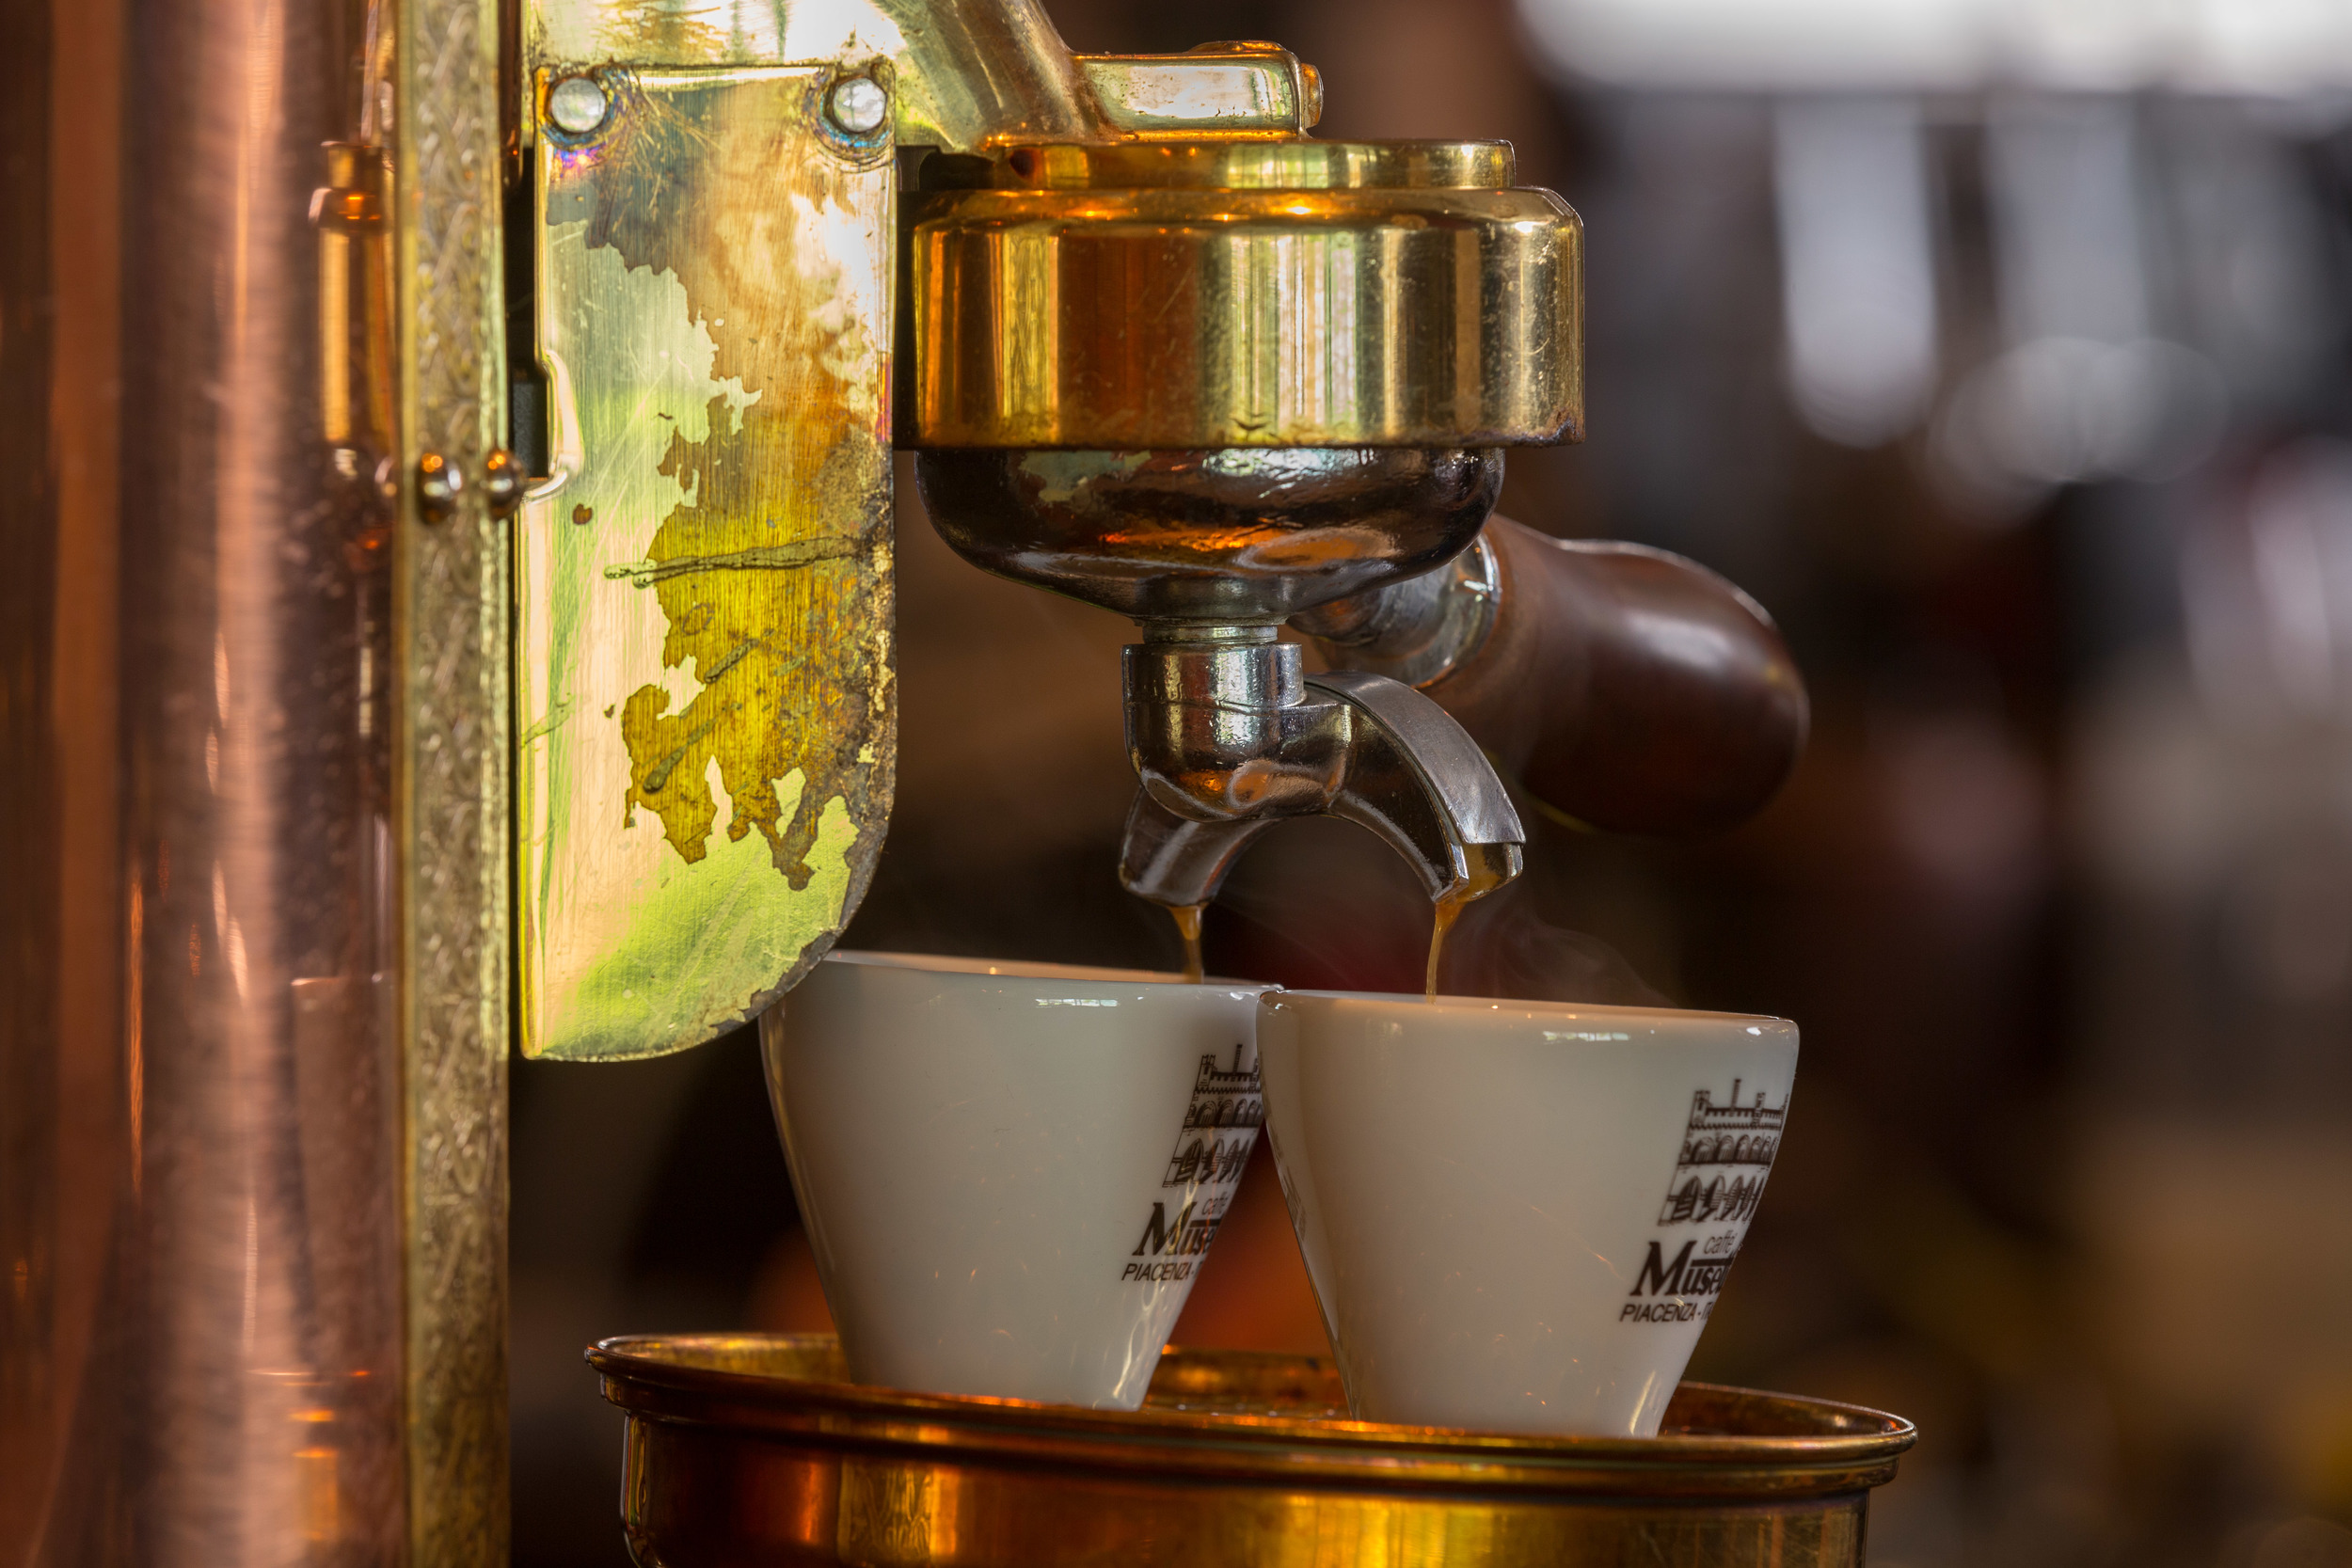 Cafe-bare-blåbær-bær-og-bar-trondheim-norge-60.jpg